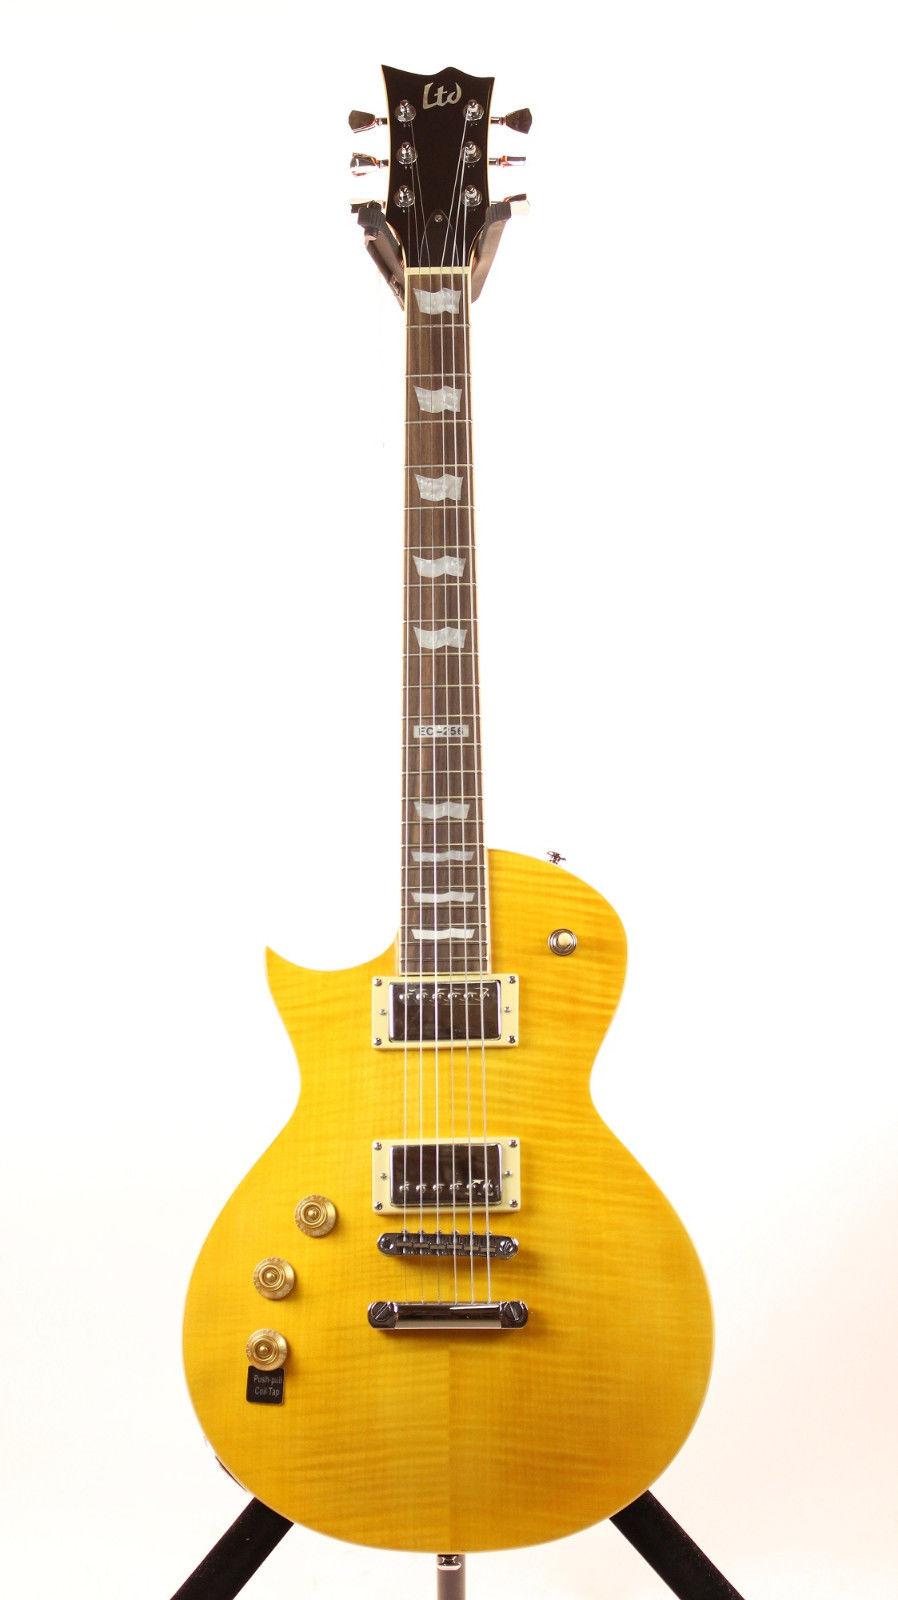 ESP LTD EC-256FM LD LH Distressed Electric Guitar Left Handed Design with Lemon Drop Finish